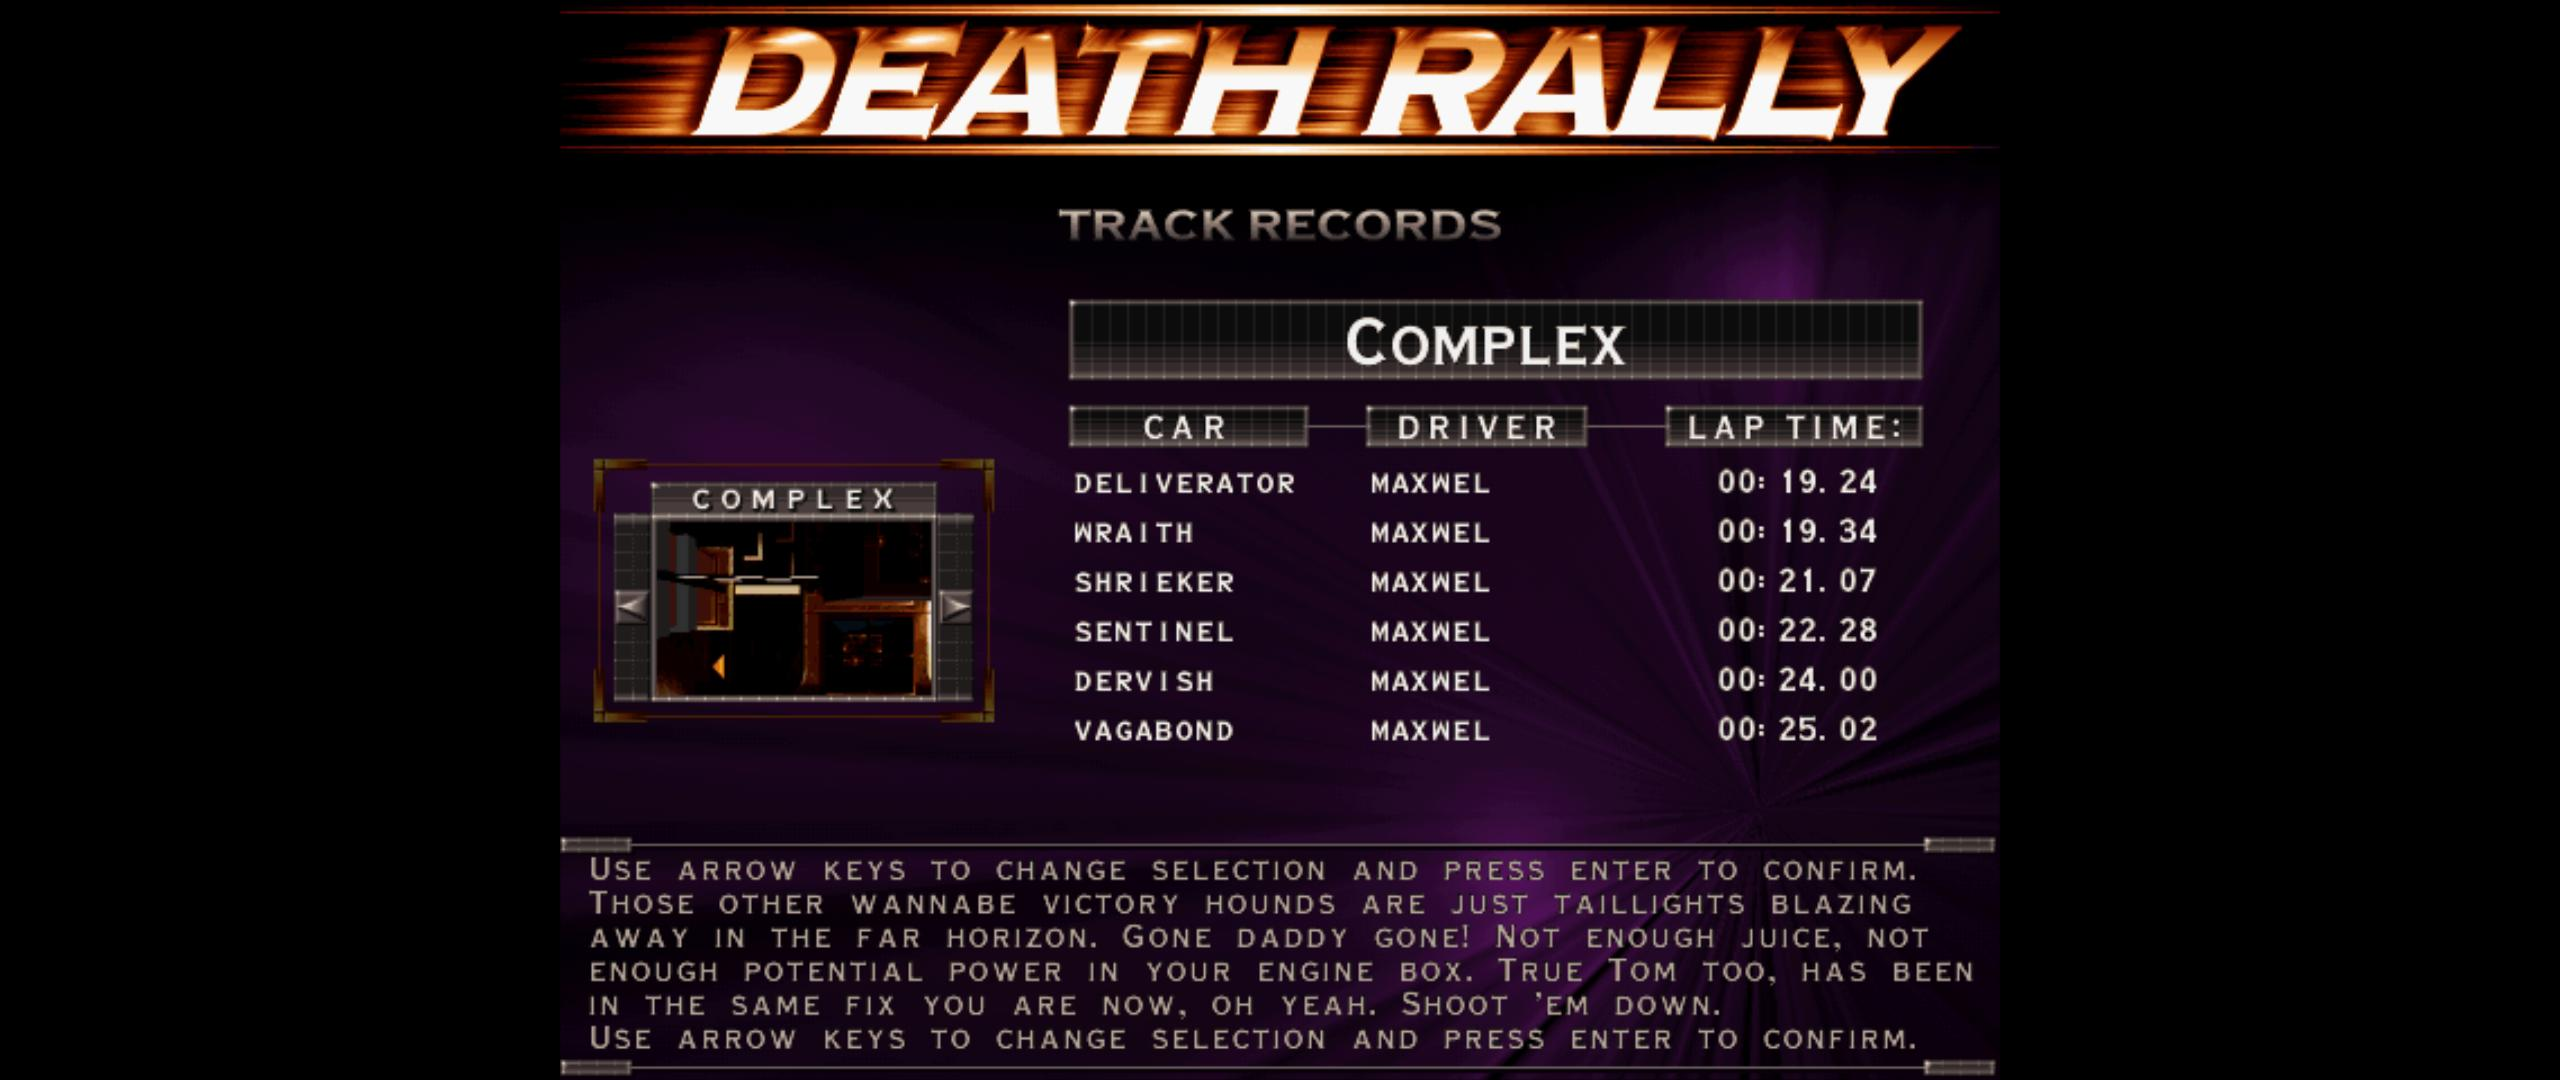 Maxwel: Death Rally [Complex, Shrieker Car] (PC) 0:00:21.07 points on 2016-03-04 07:43:46